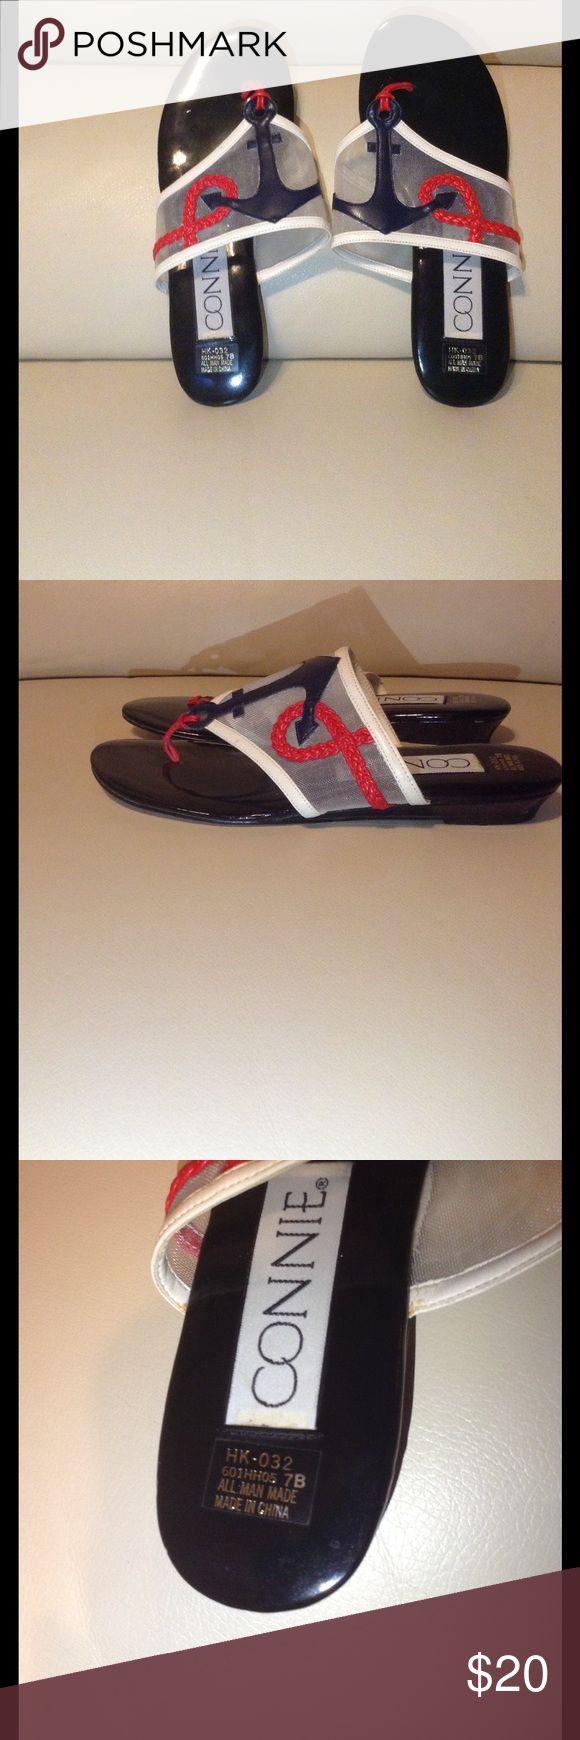 Connie nautical flip flop sandals Excellent condition anchor red white and blue flip flops! Connie Shoes Sandals